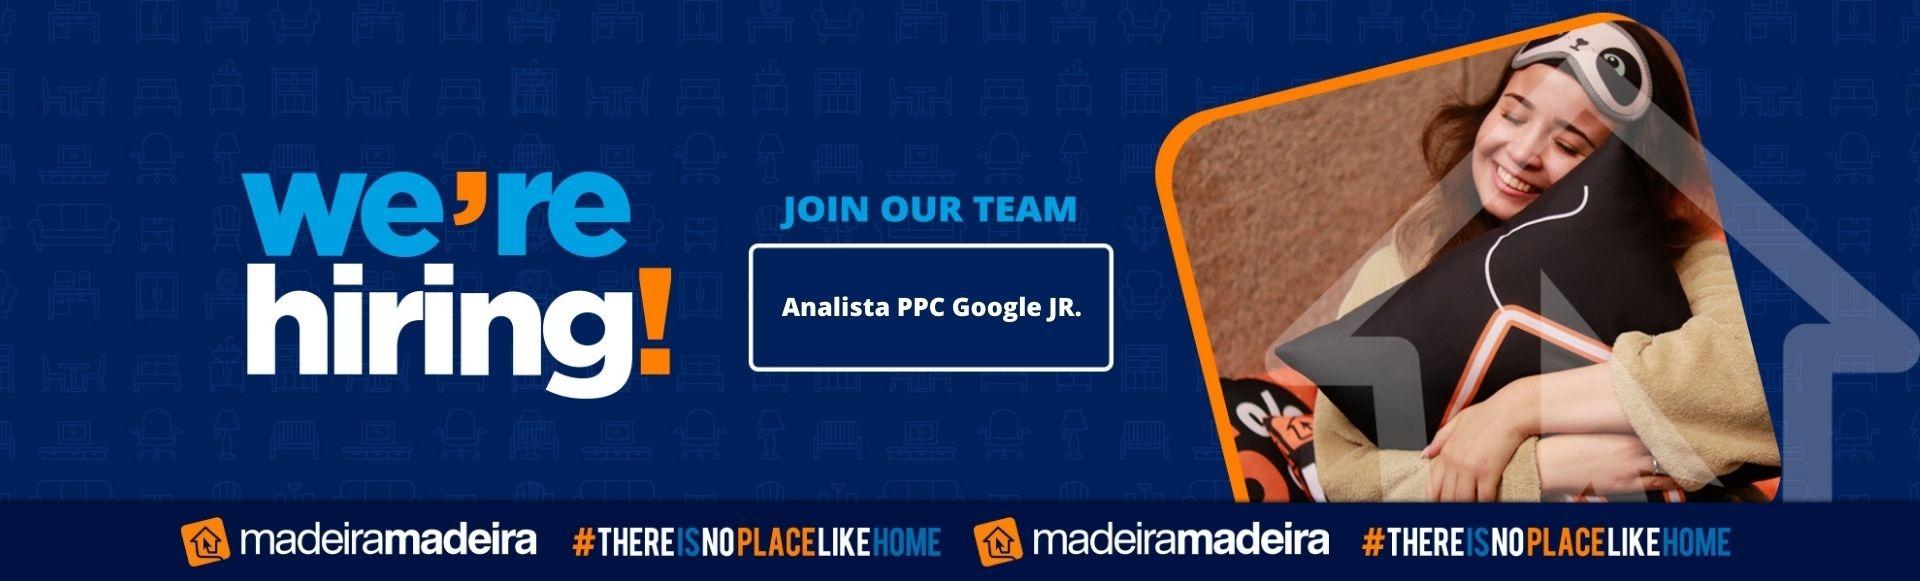 Analista PPC Google JR